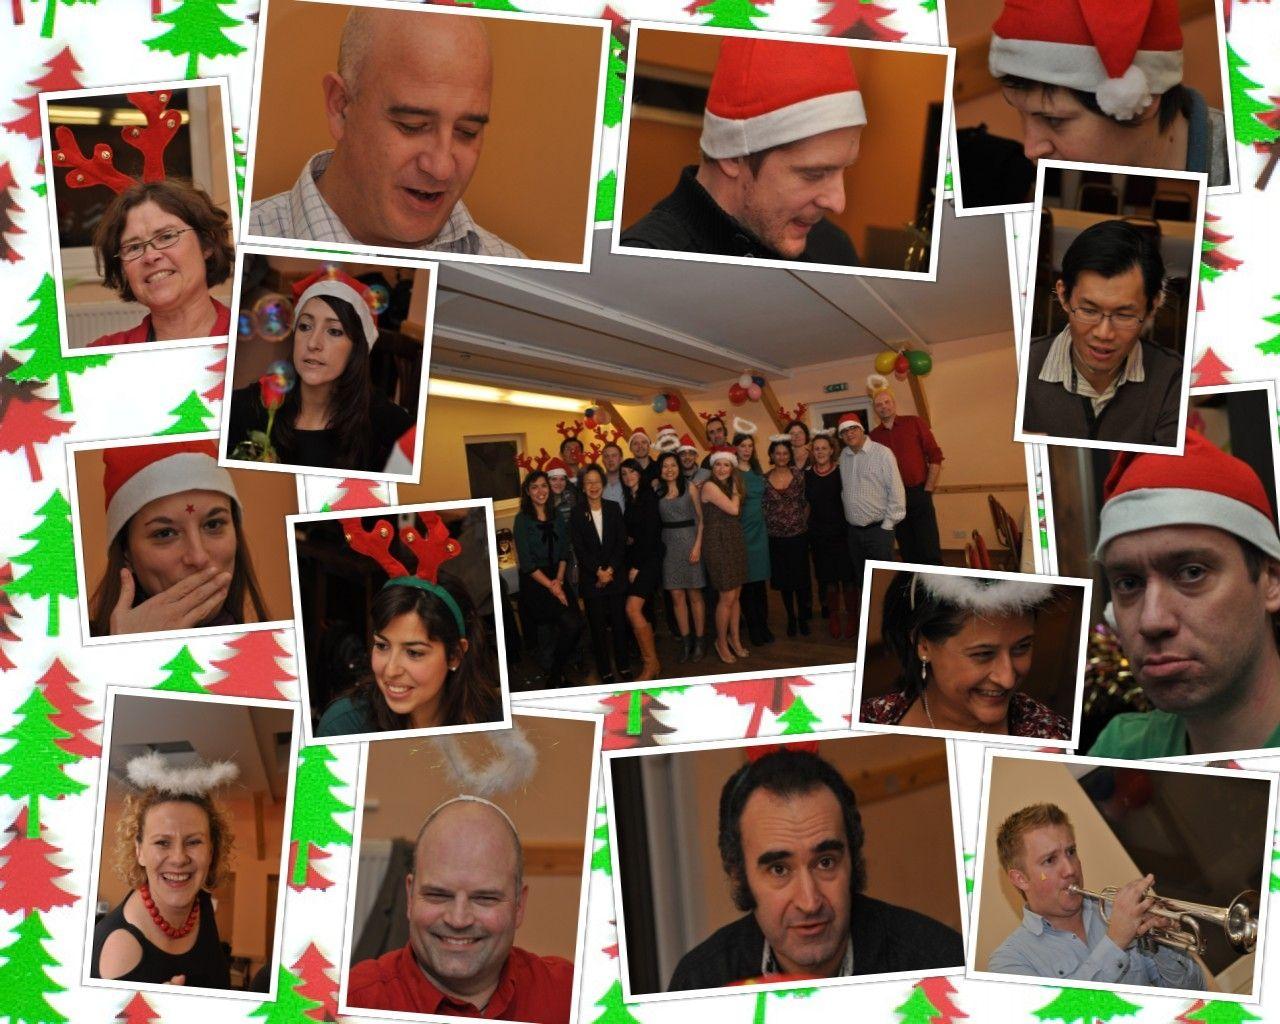 Christmas-Collage-2.jpg